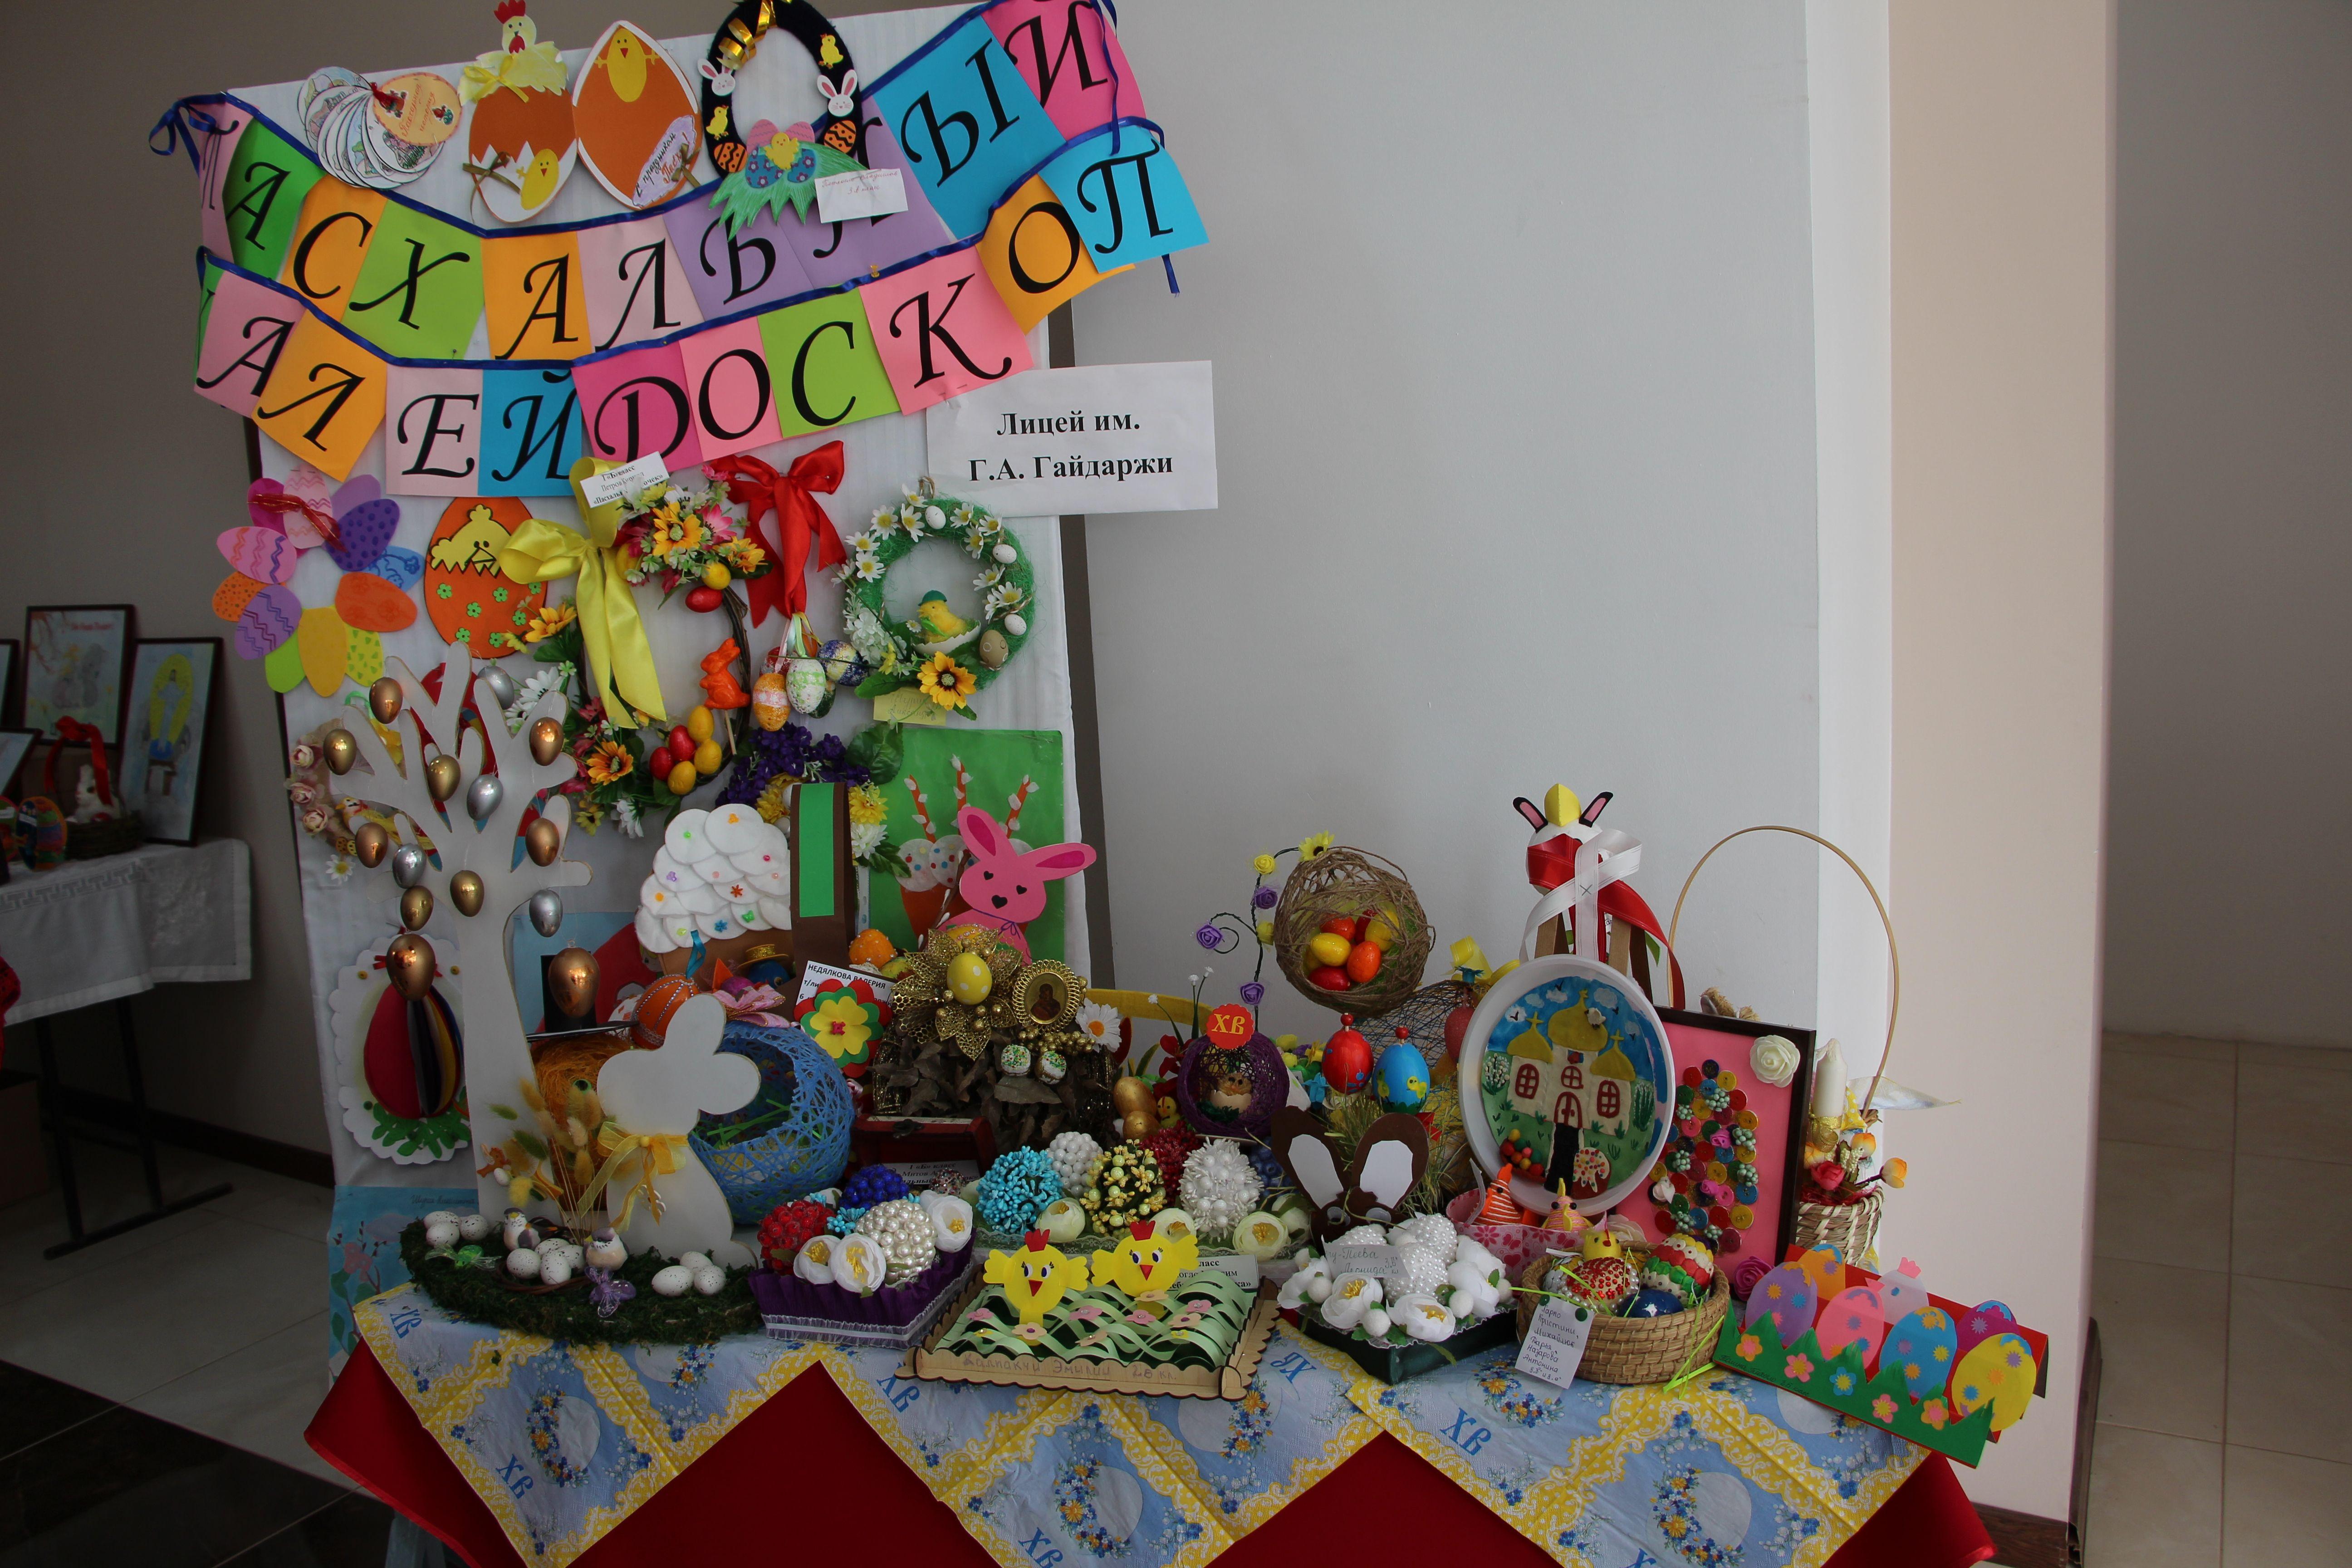 Пасхальная выставка «Paskellä adetleri»